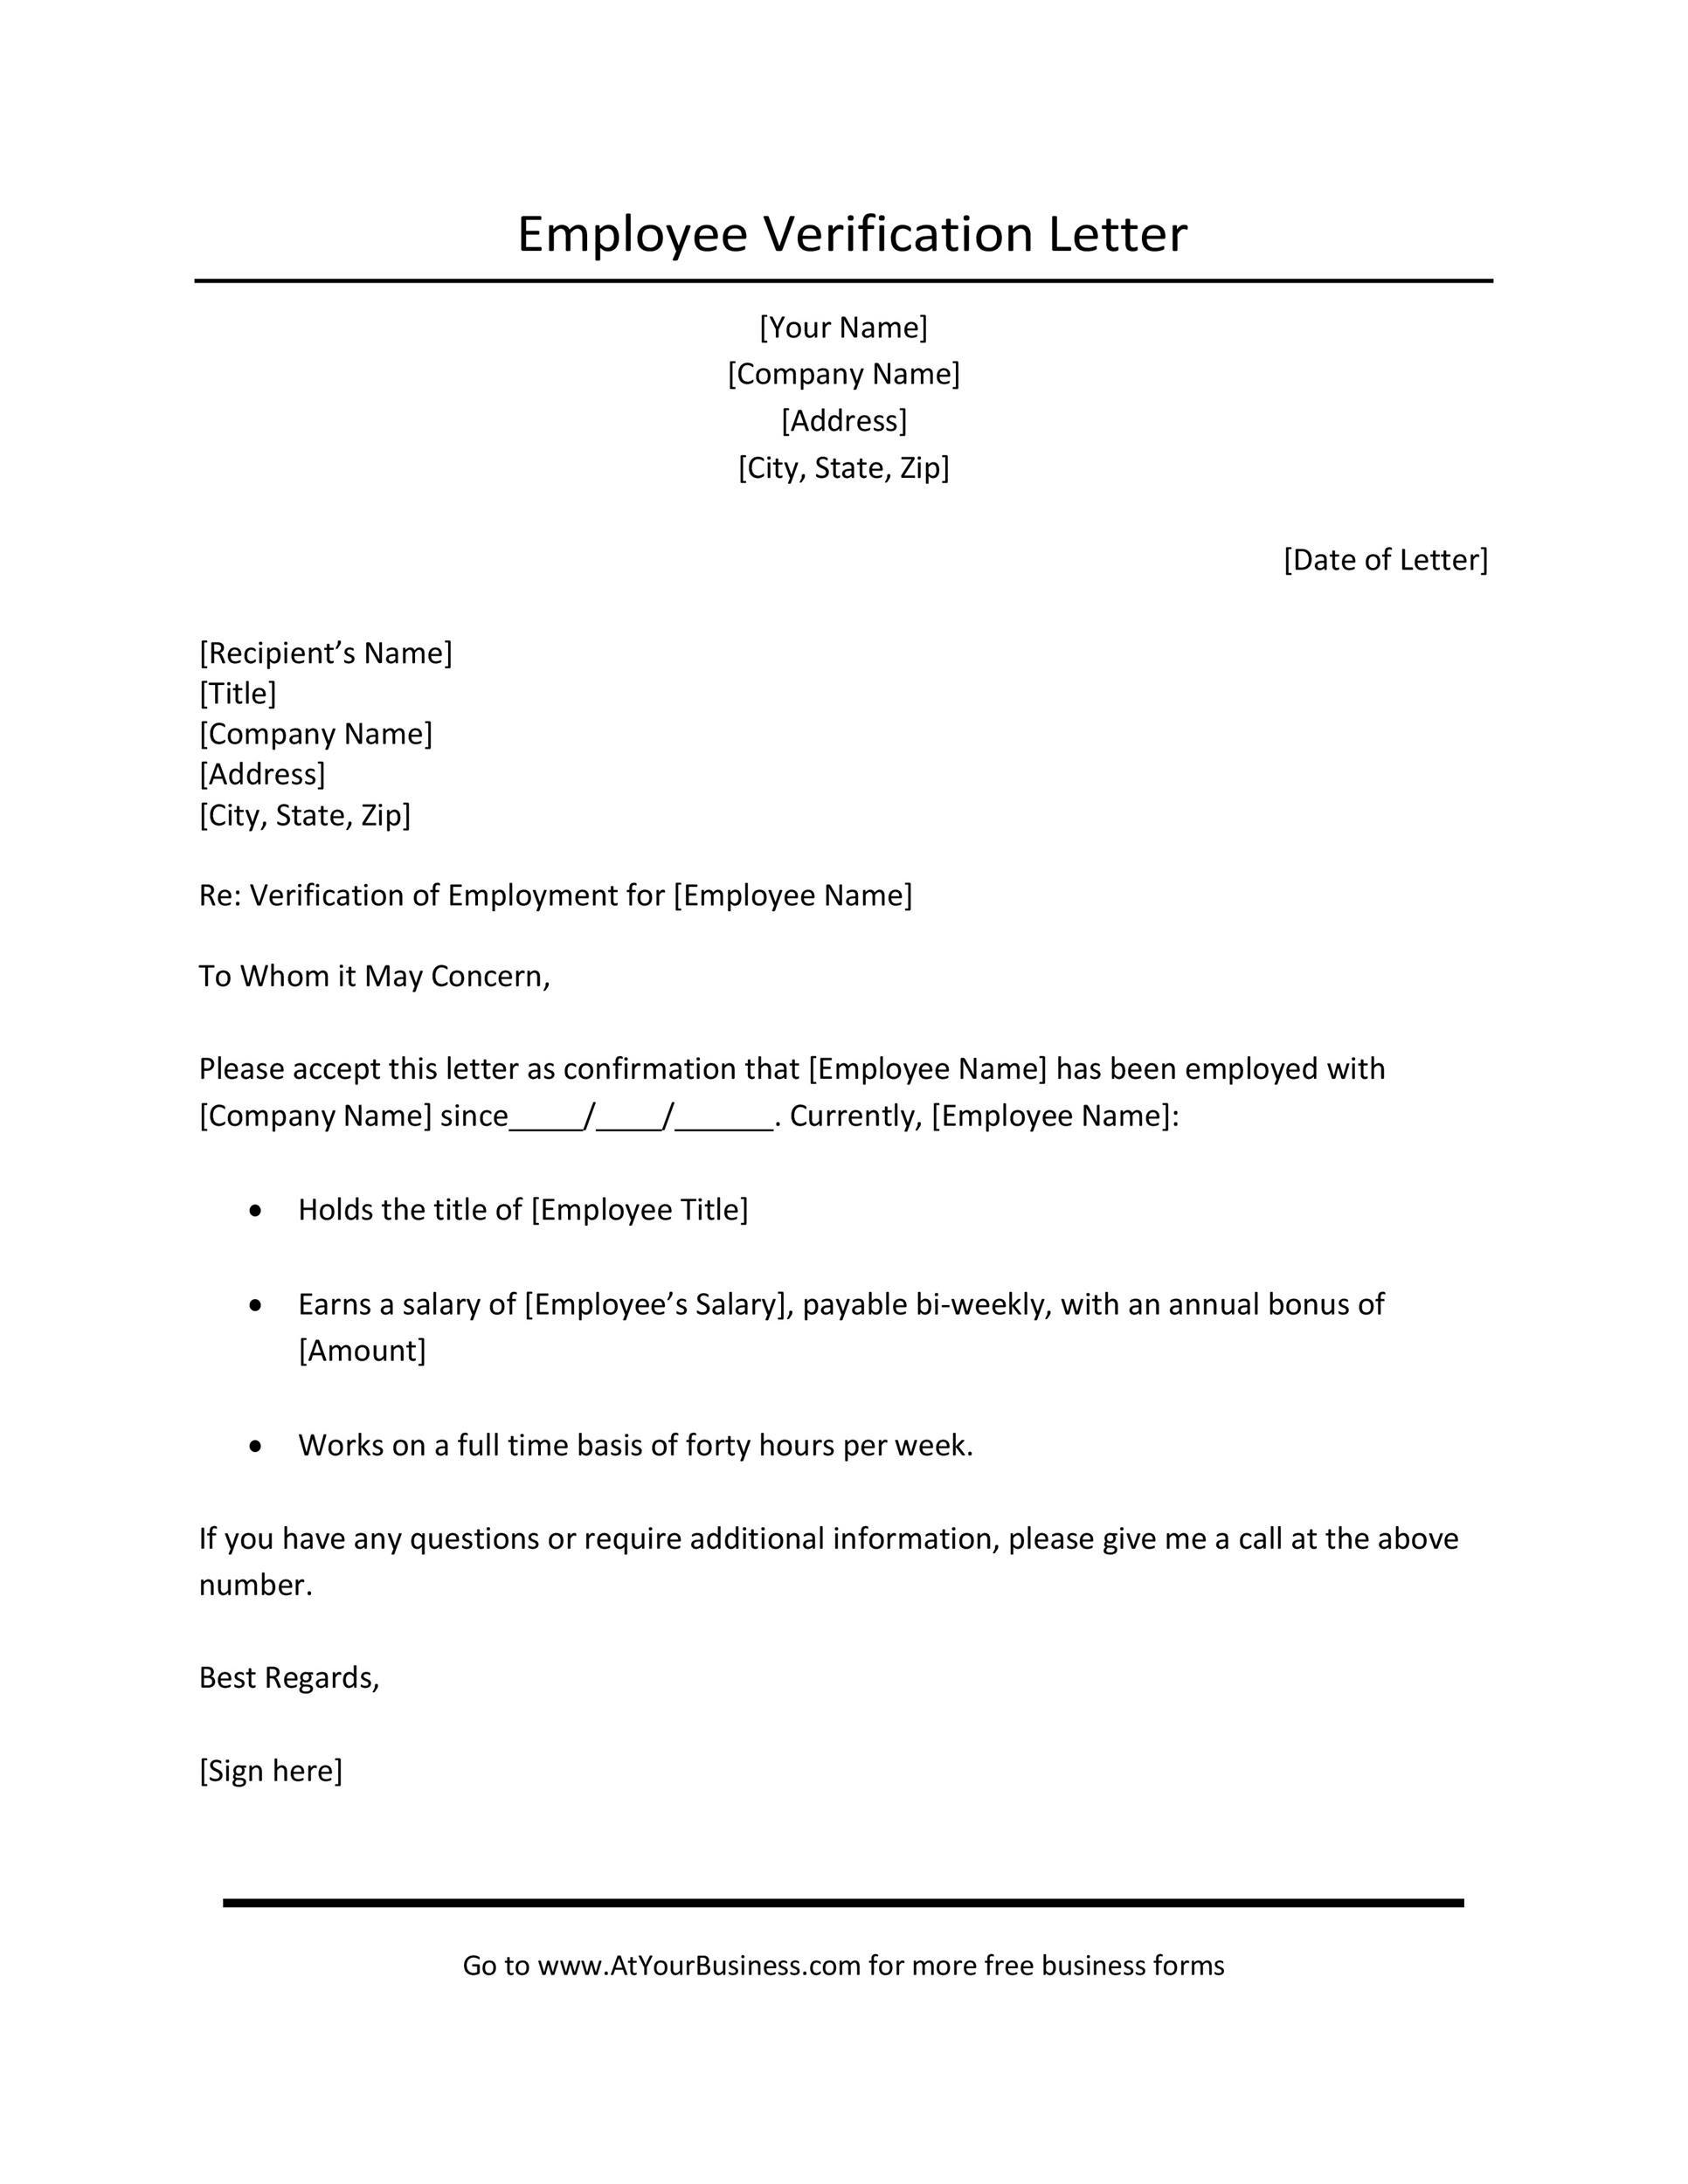 Free income verification letter 09